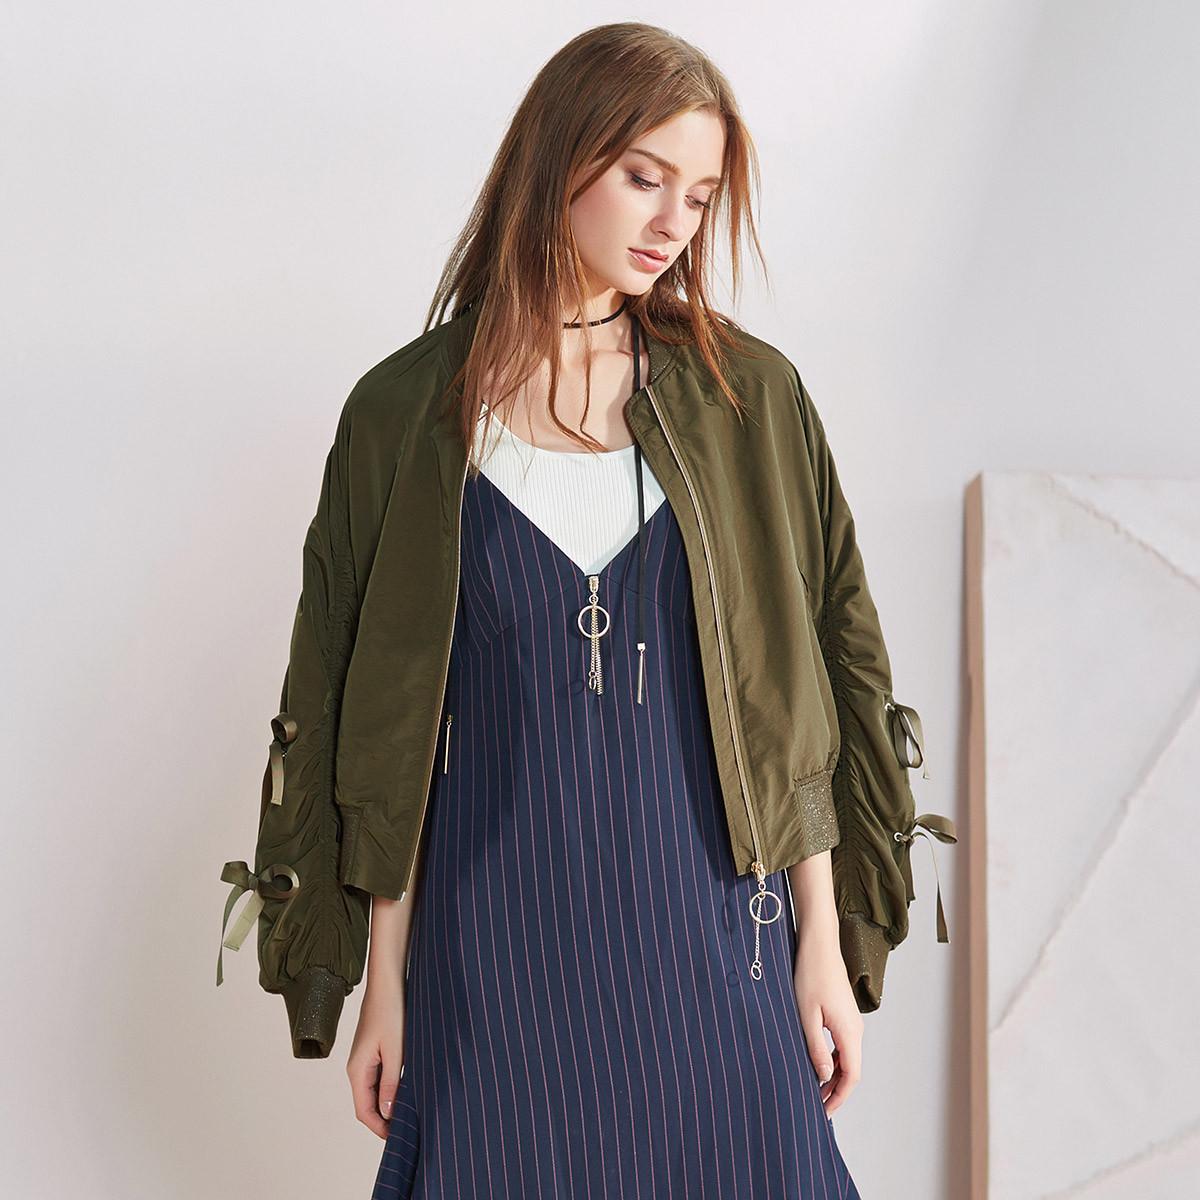 XGXG雪歌春季袖口绑带松紧褶皱设计女款棒球衫外套XE107018A343